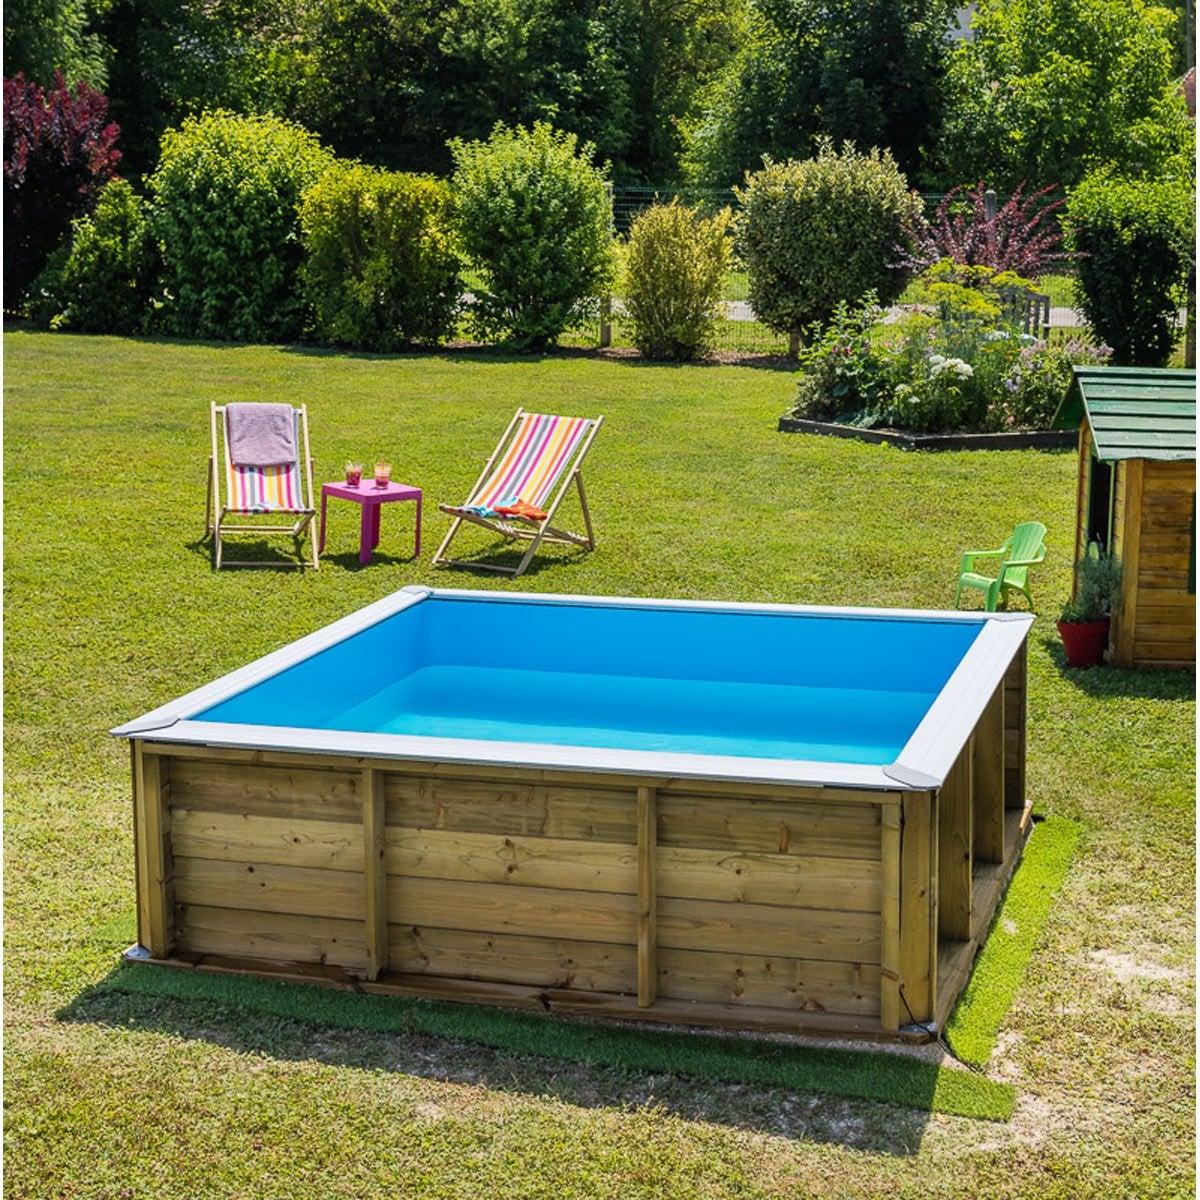 piscine bois pistoche bwt mypool l226 x l226 x h067